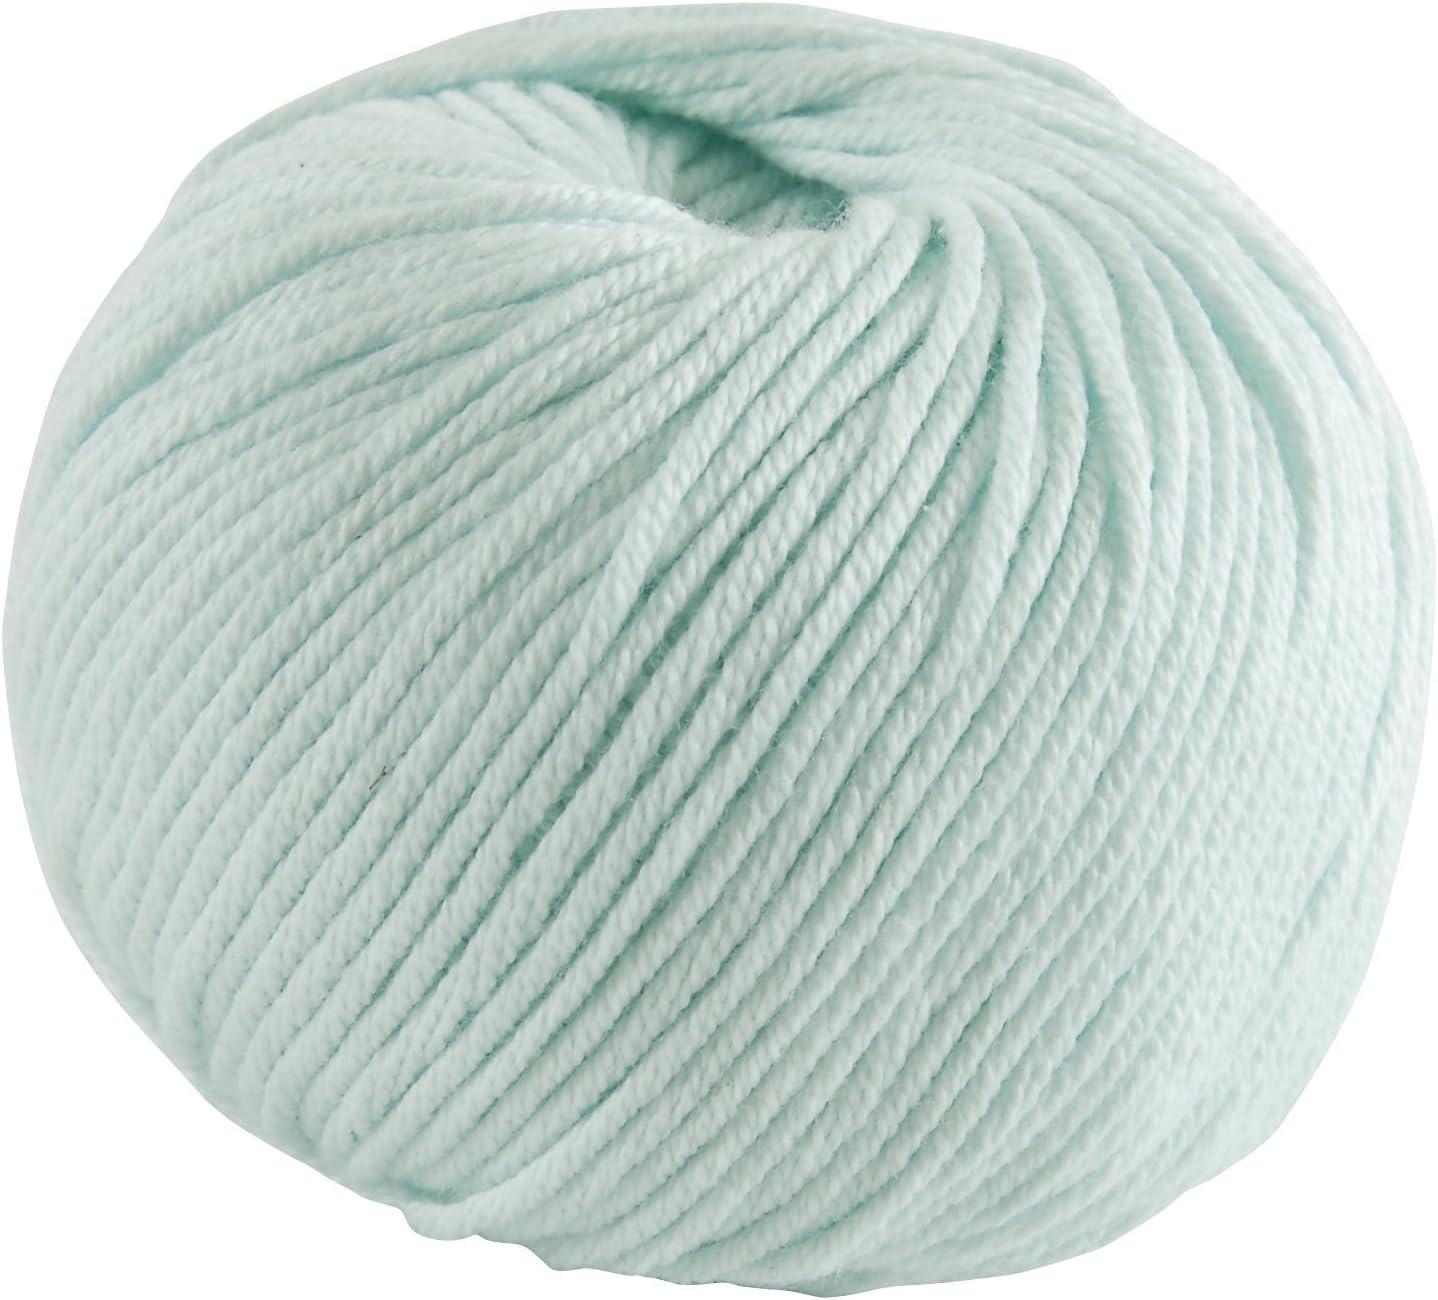 DMC Natura Ovillo, 100% algodón, Talla Mediana, Color 137: Amazon.es: Hogar